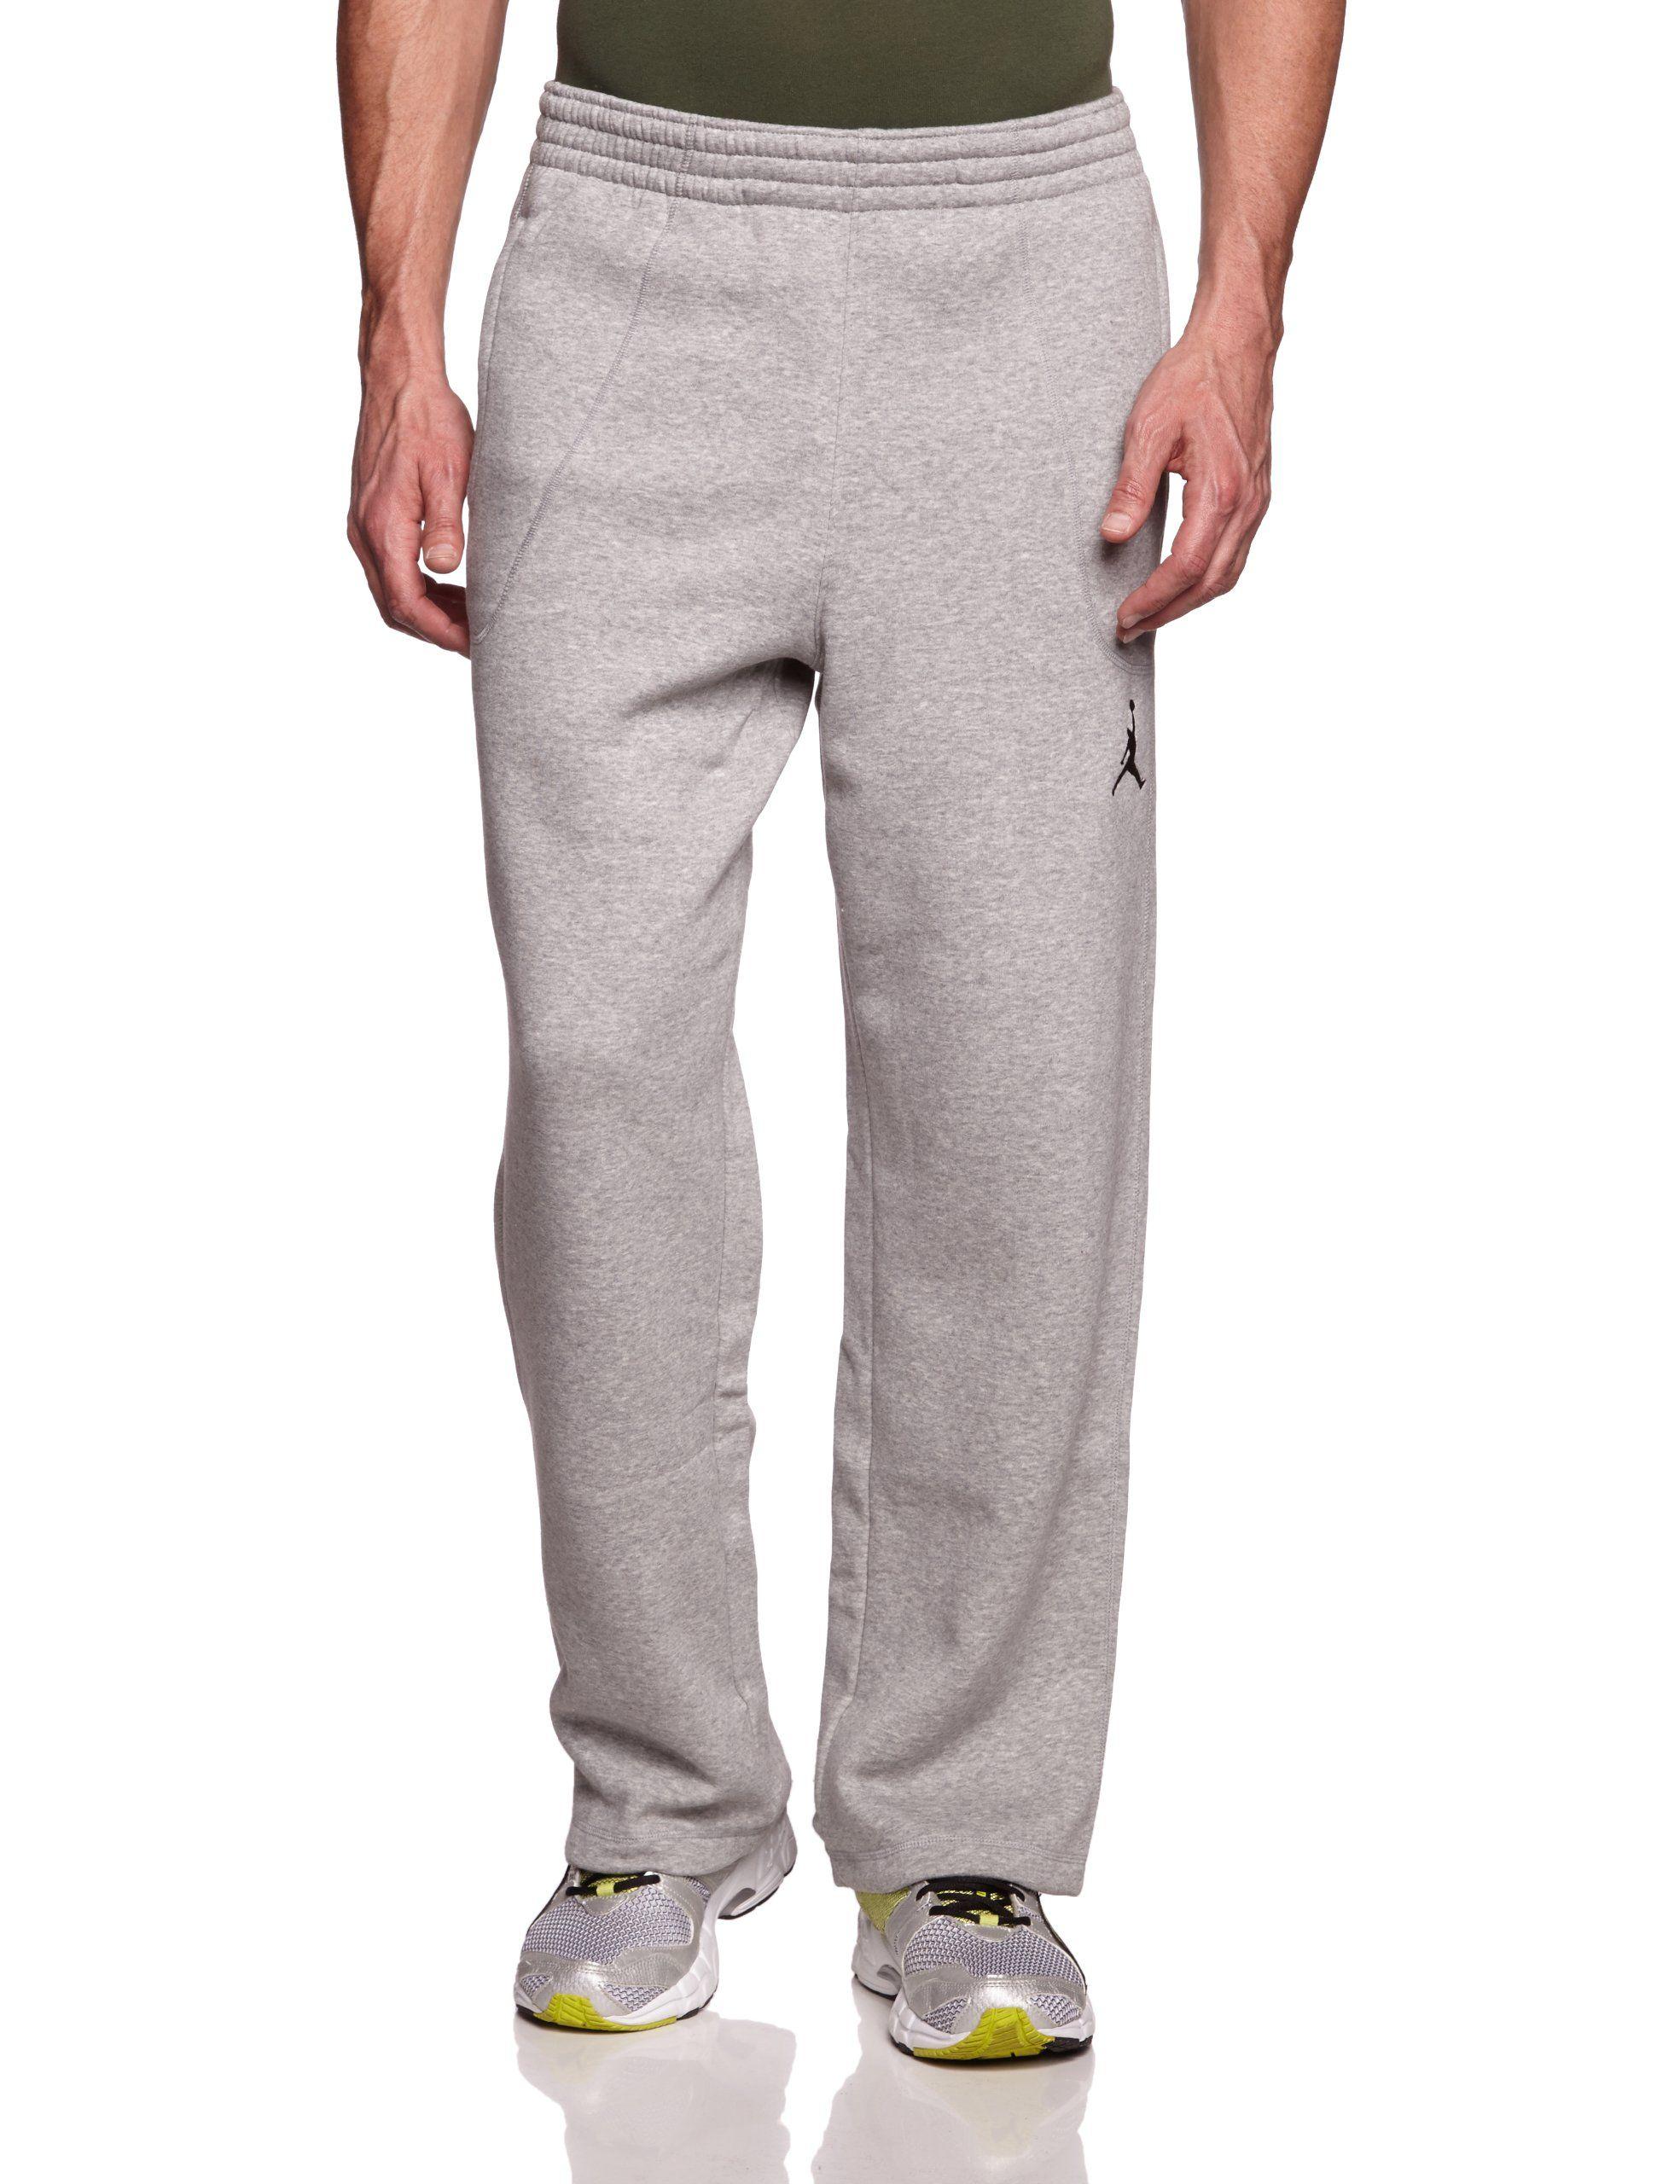 1a41c8270dd65e Mens Nike Air Jordan 23 7 Fleece Sweatpants Dark Grey Heather Black  547662-063 Size X-Large